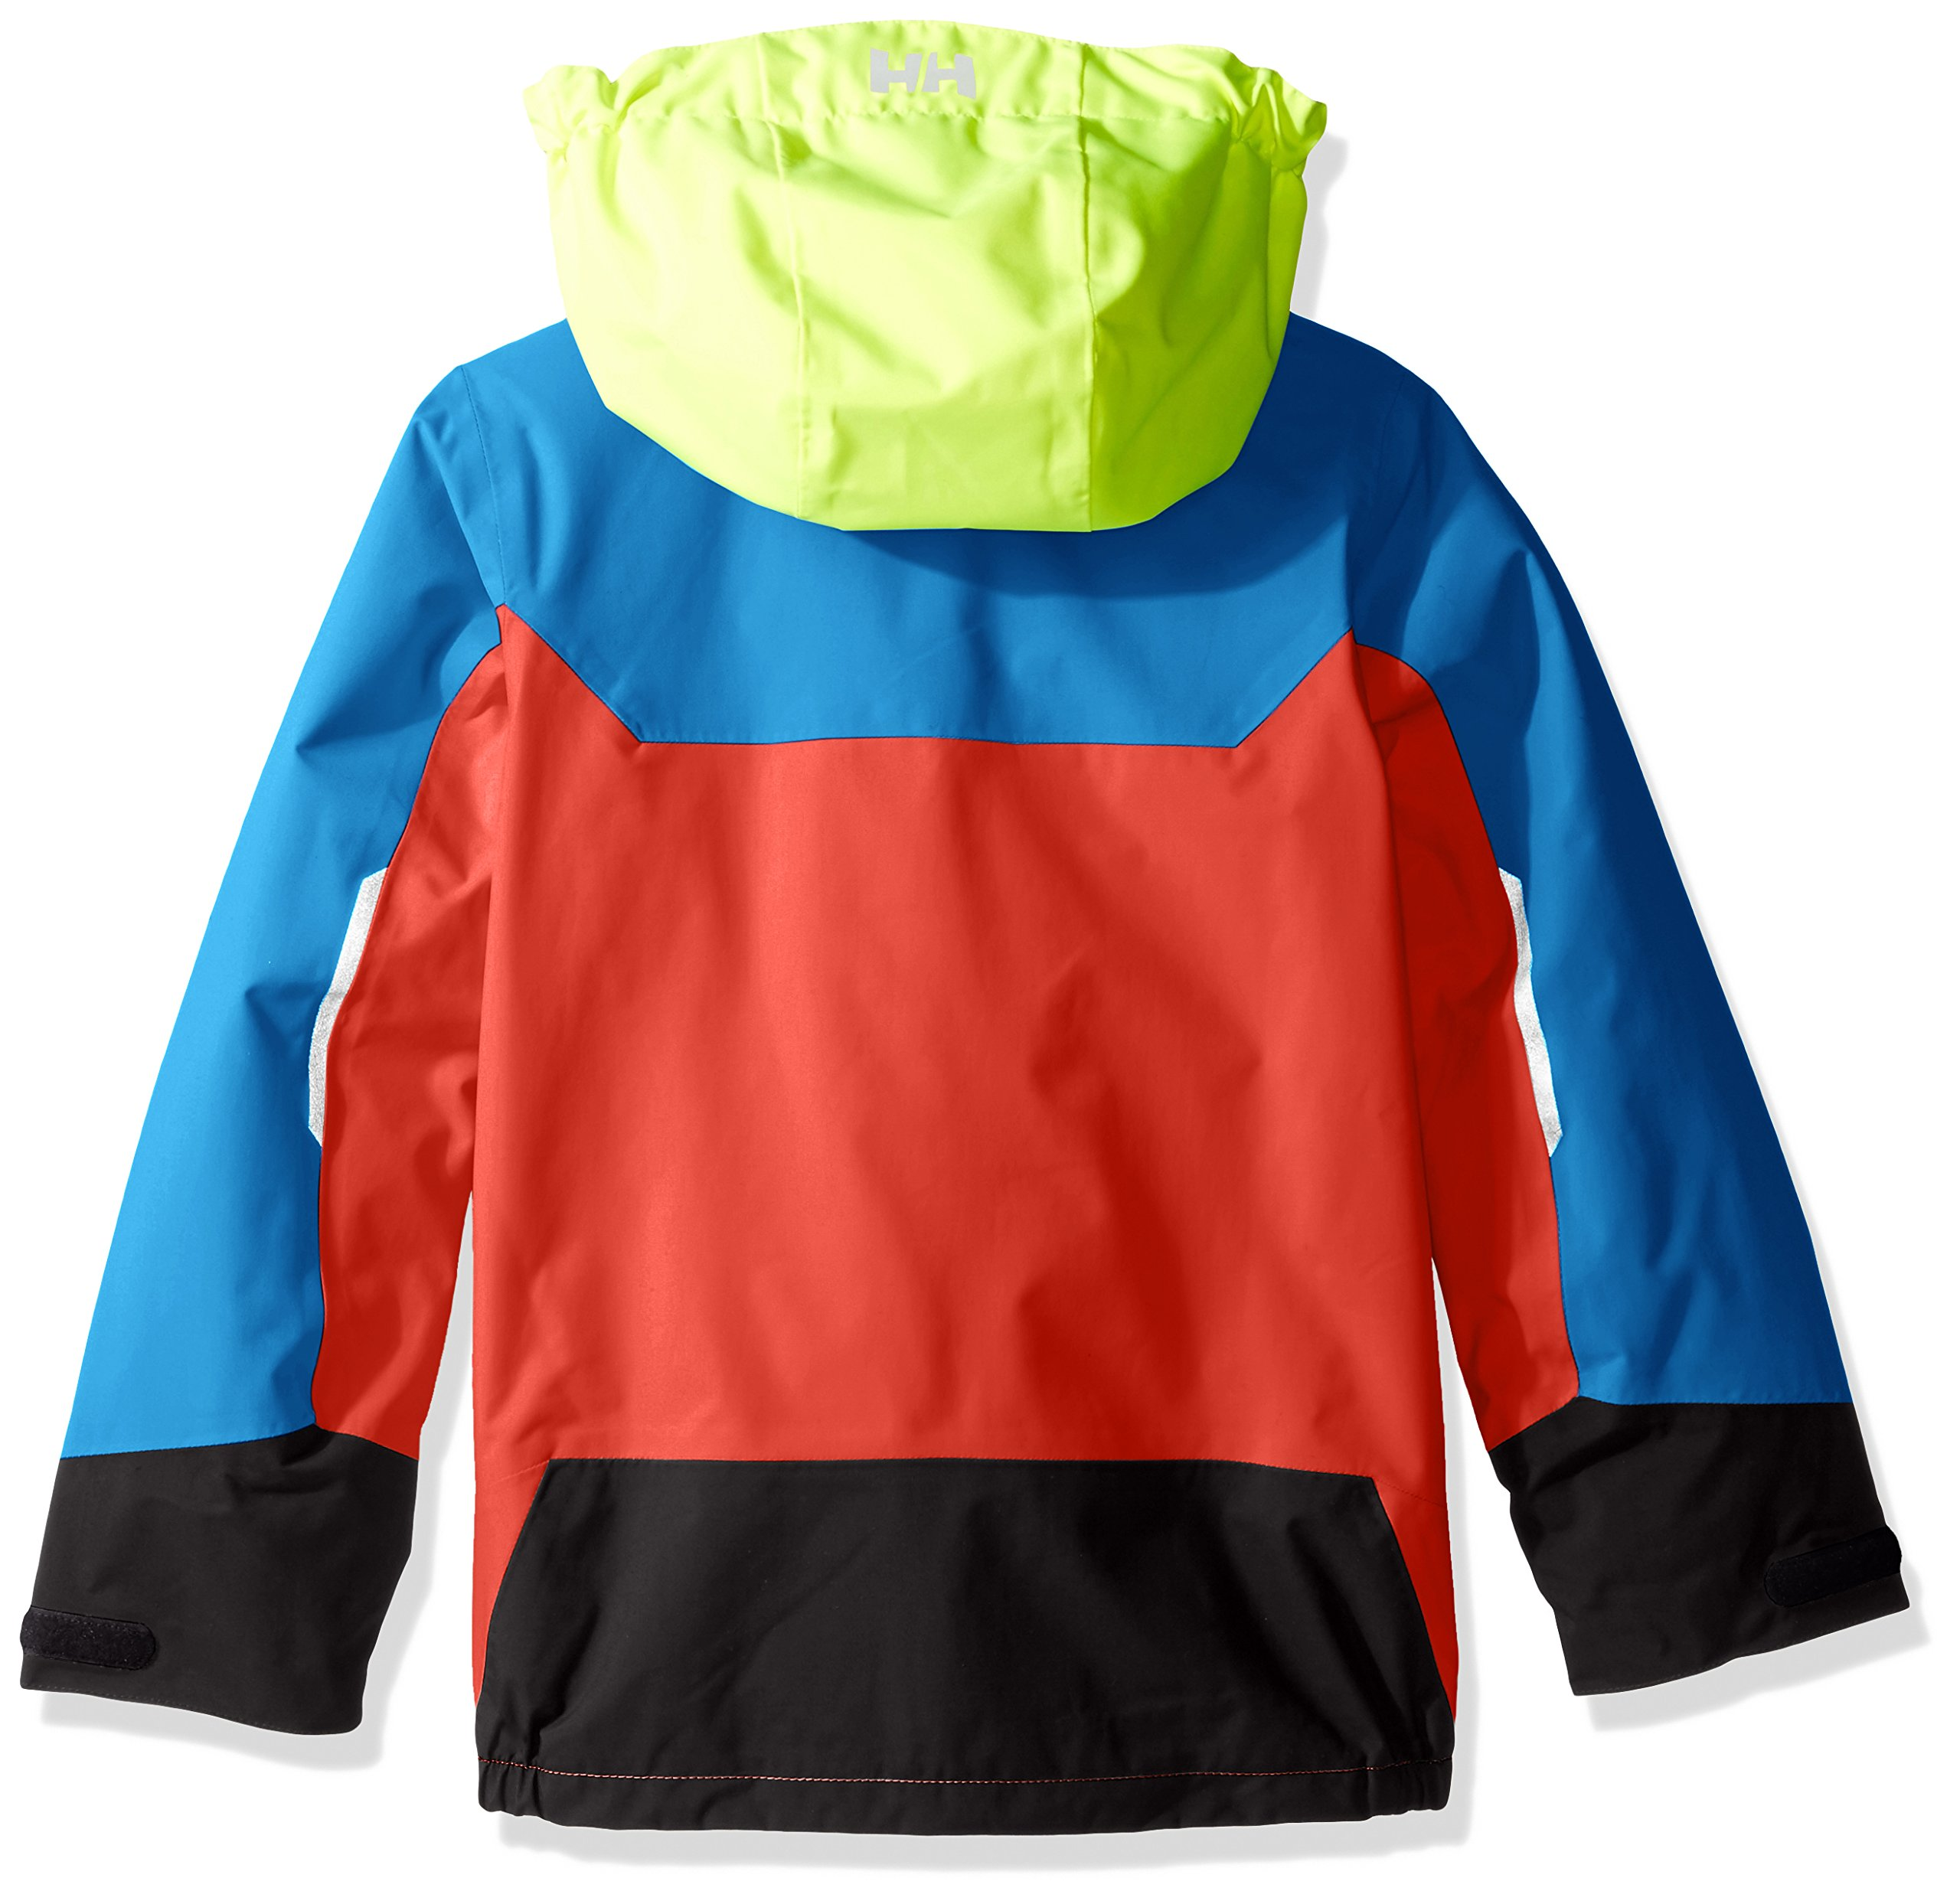 Helly Hansen Kids Shelter Waterproof Rain Jacket Coat, 102 Cayenne, Size 1 by Helly Hansen (Image #2)